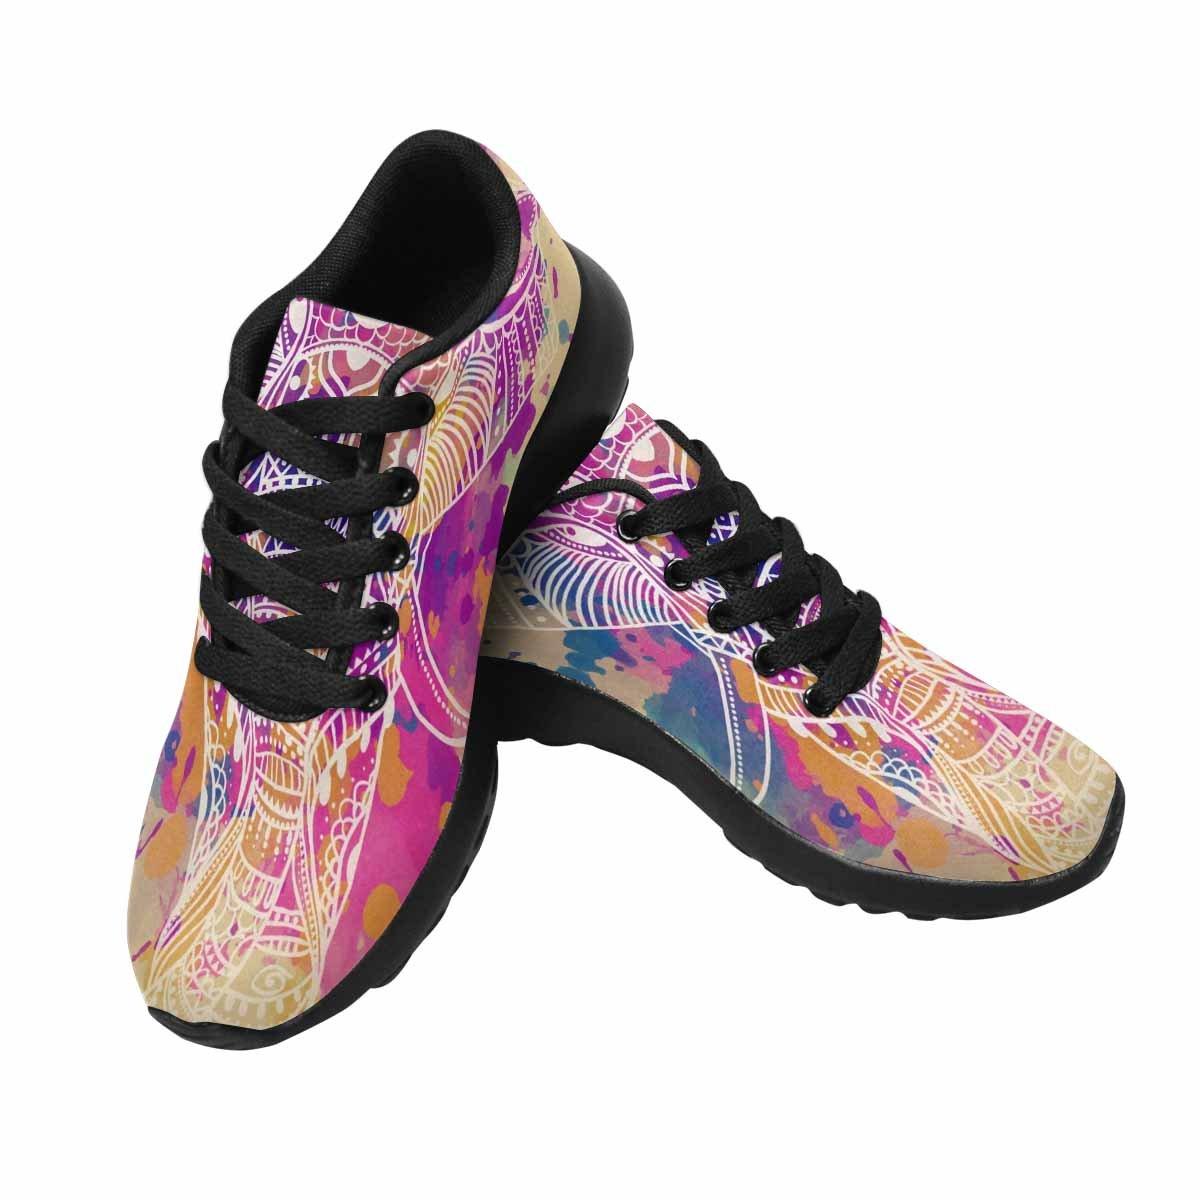 InterestPrint Women's Go Easy Walking Comfort Sports Athletic Shoes Greeting Card Elephant, Frame Animal, US 7